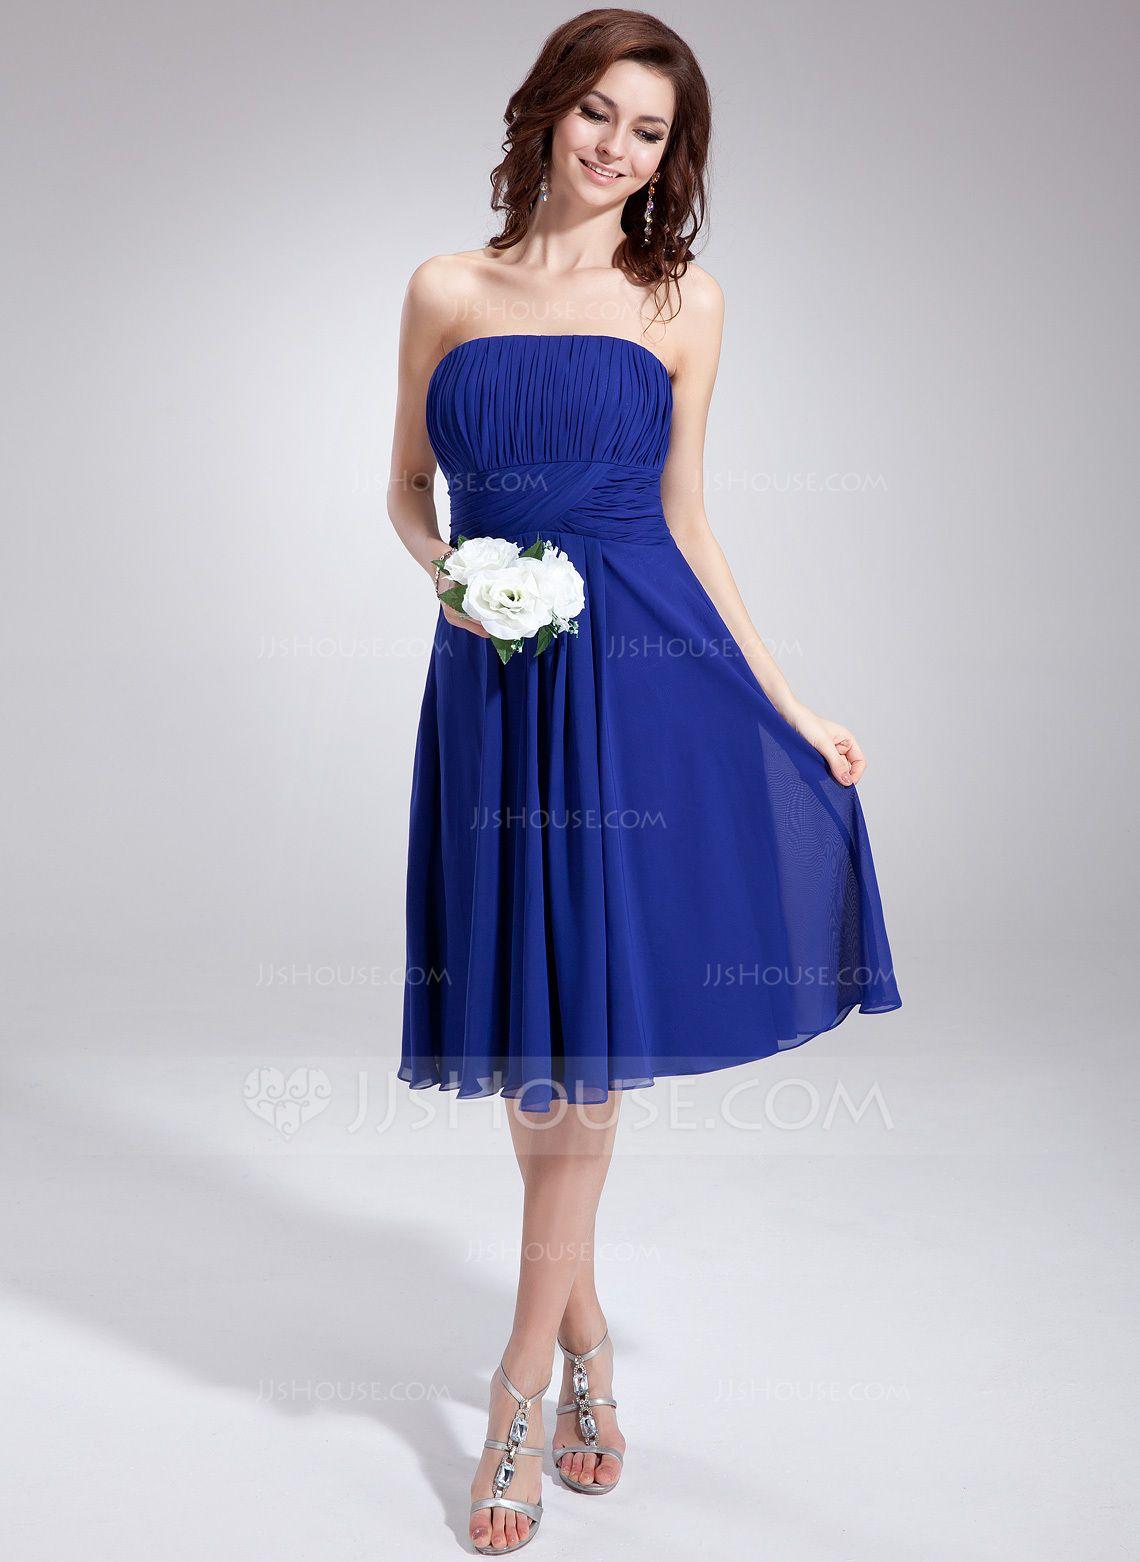 ALine/Princess Strapless KneeLength Chiffon Bridesmaid